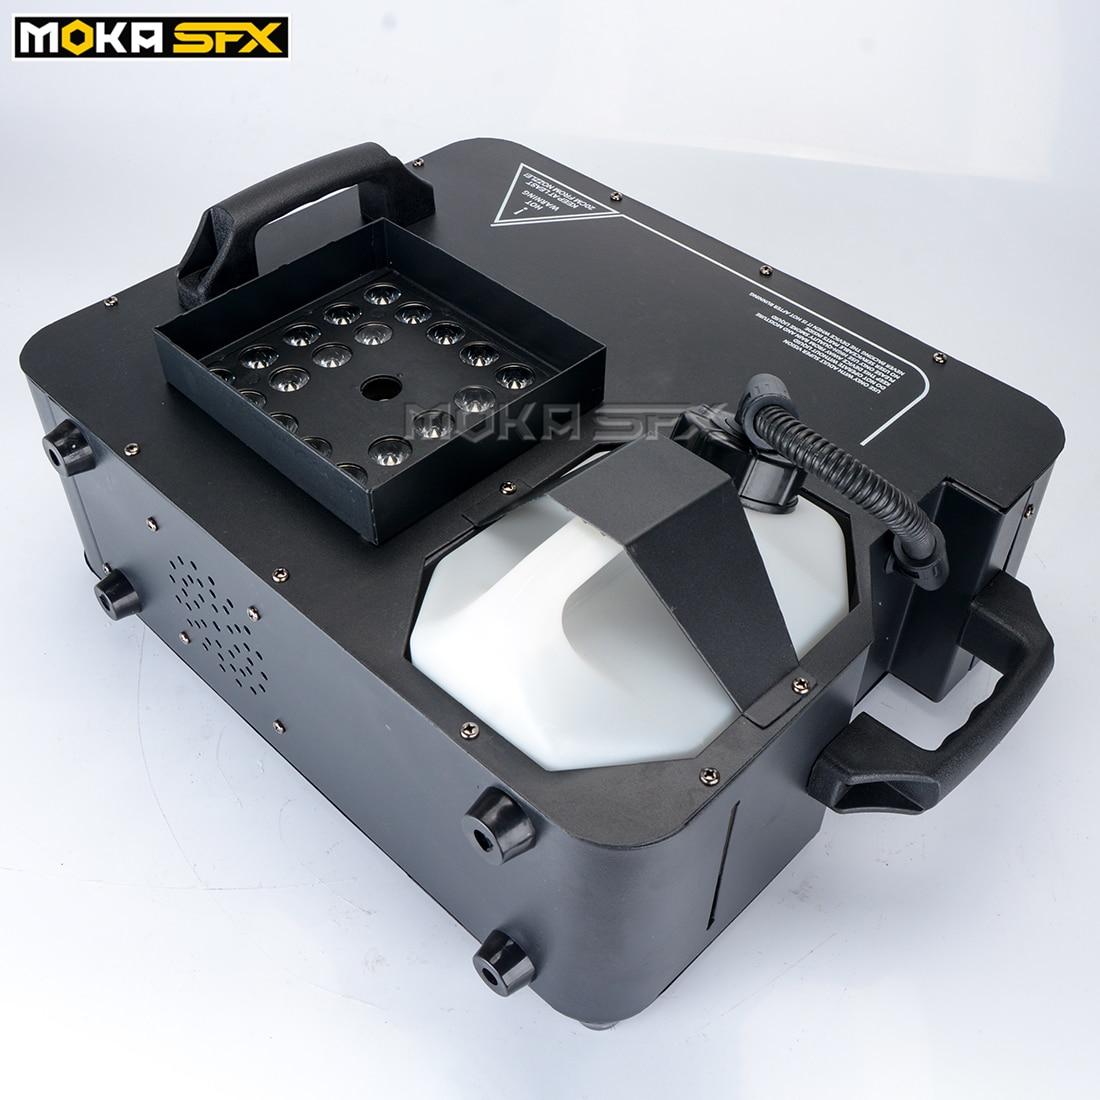 DMX Control Vertical Fog Machine 24X3W RGB LED Lights Stage Smoke Generator 1500W LED Special Effects Fog Machine For Dj Party